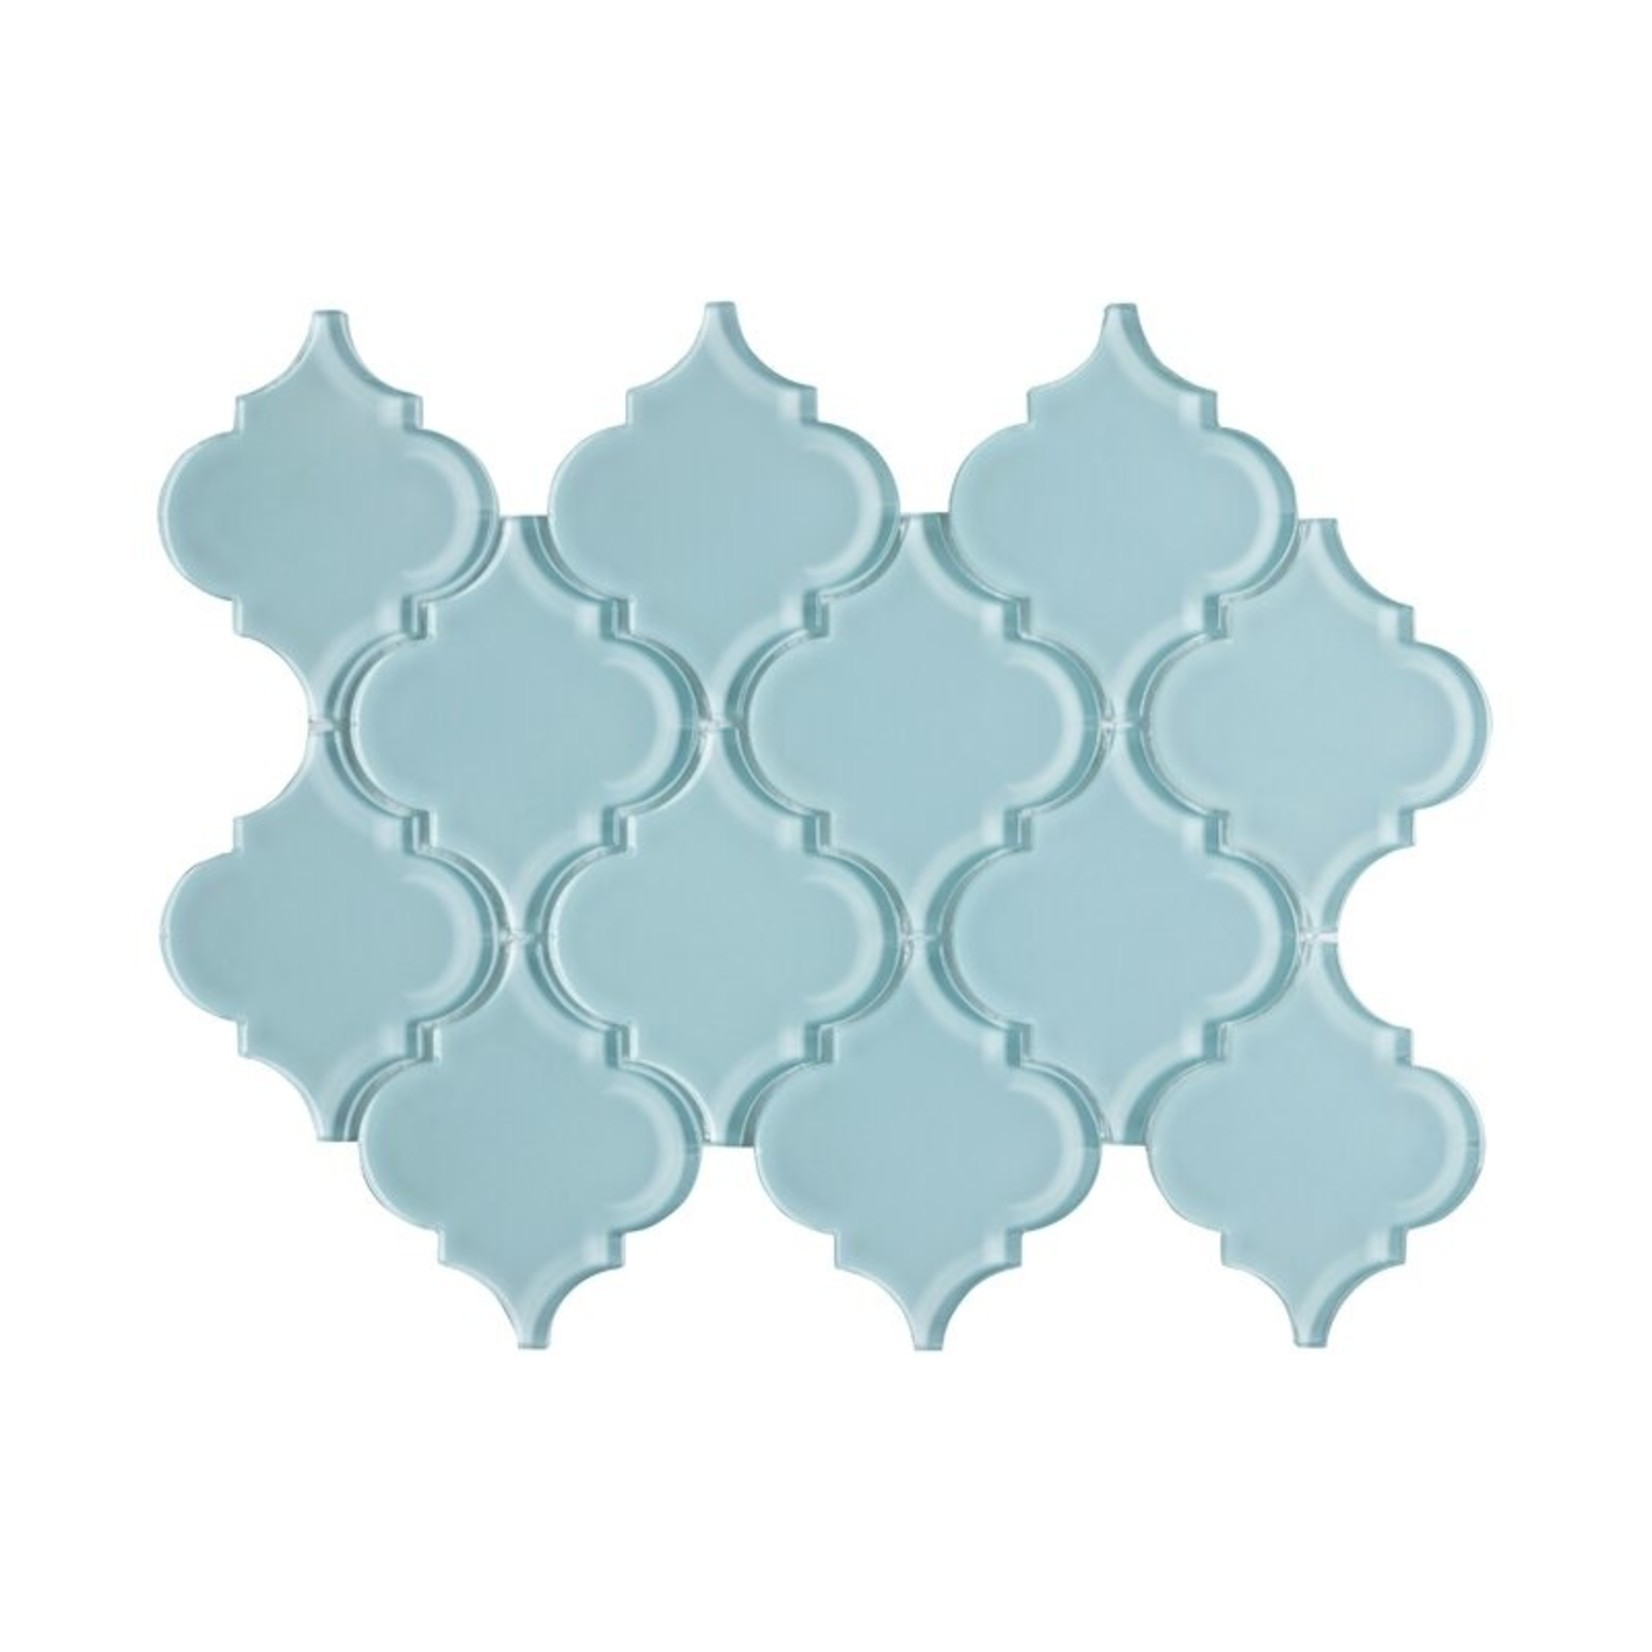 "*Water Jet Series 3"" x 4"" Glass Arabesque Mosaic Tile - Baby Blue"